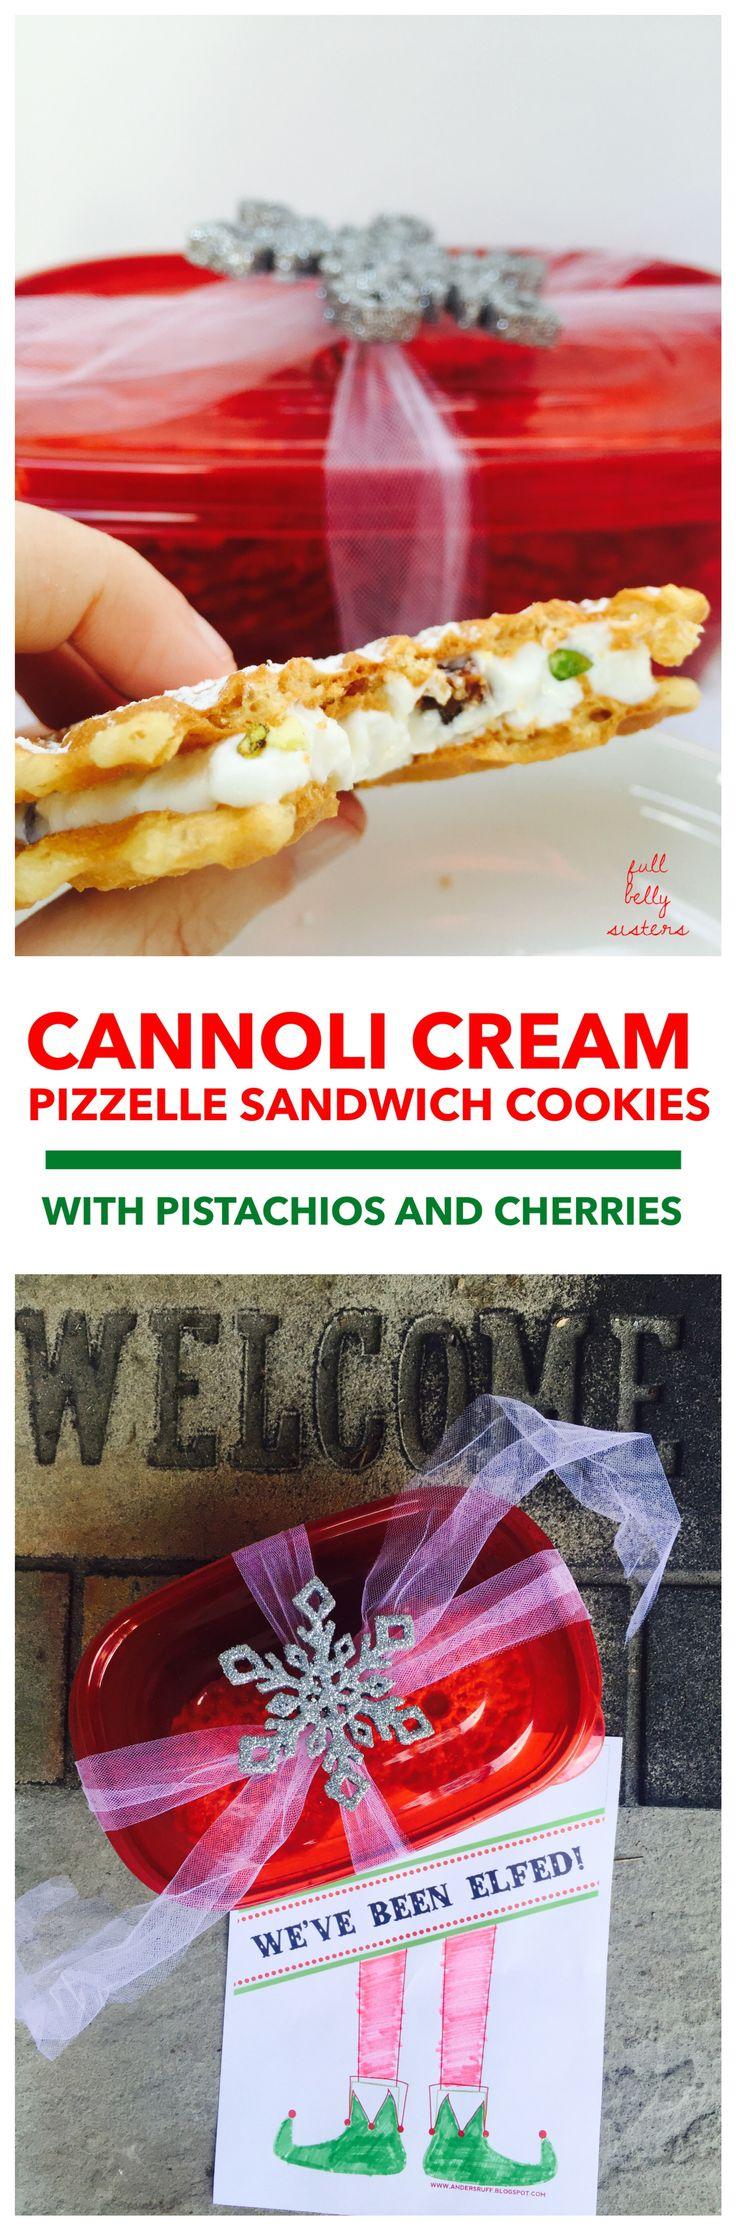 Cannoli cream, Sandwich cookies and Cannoli on Pinterest